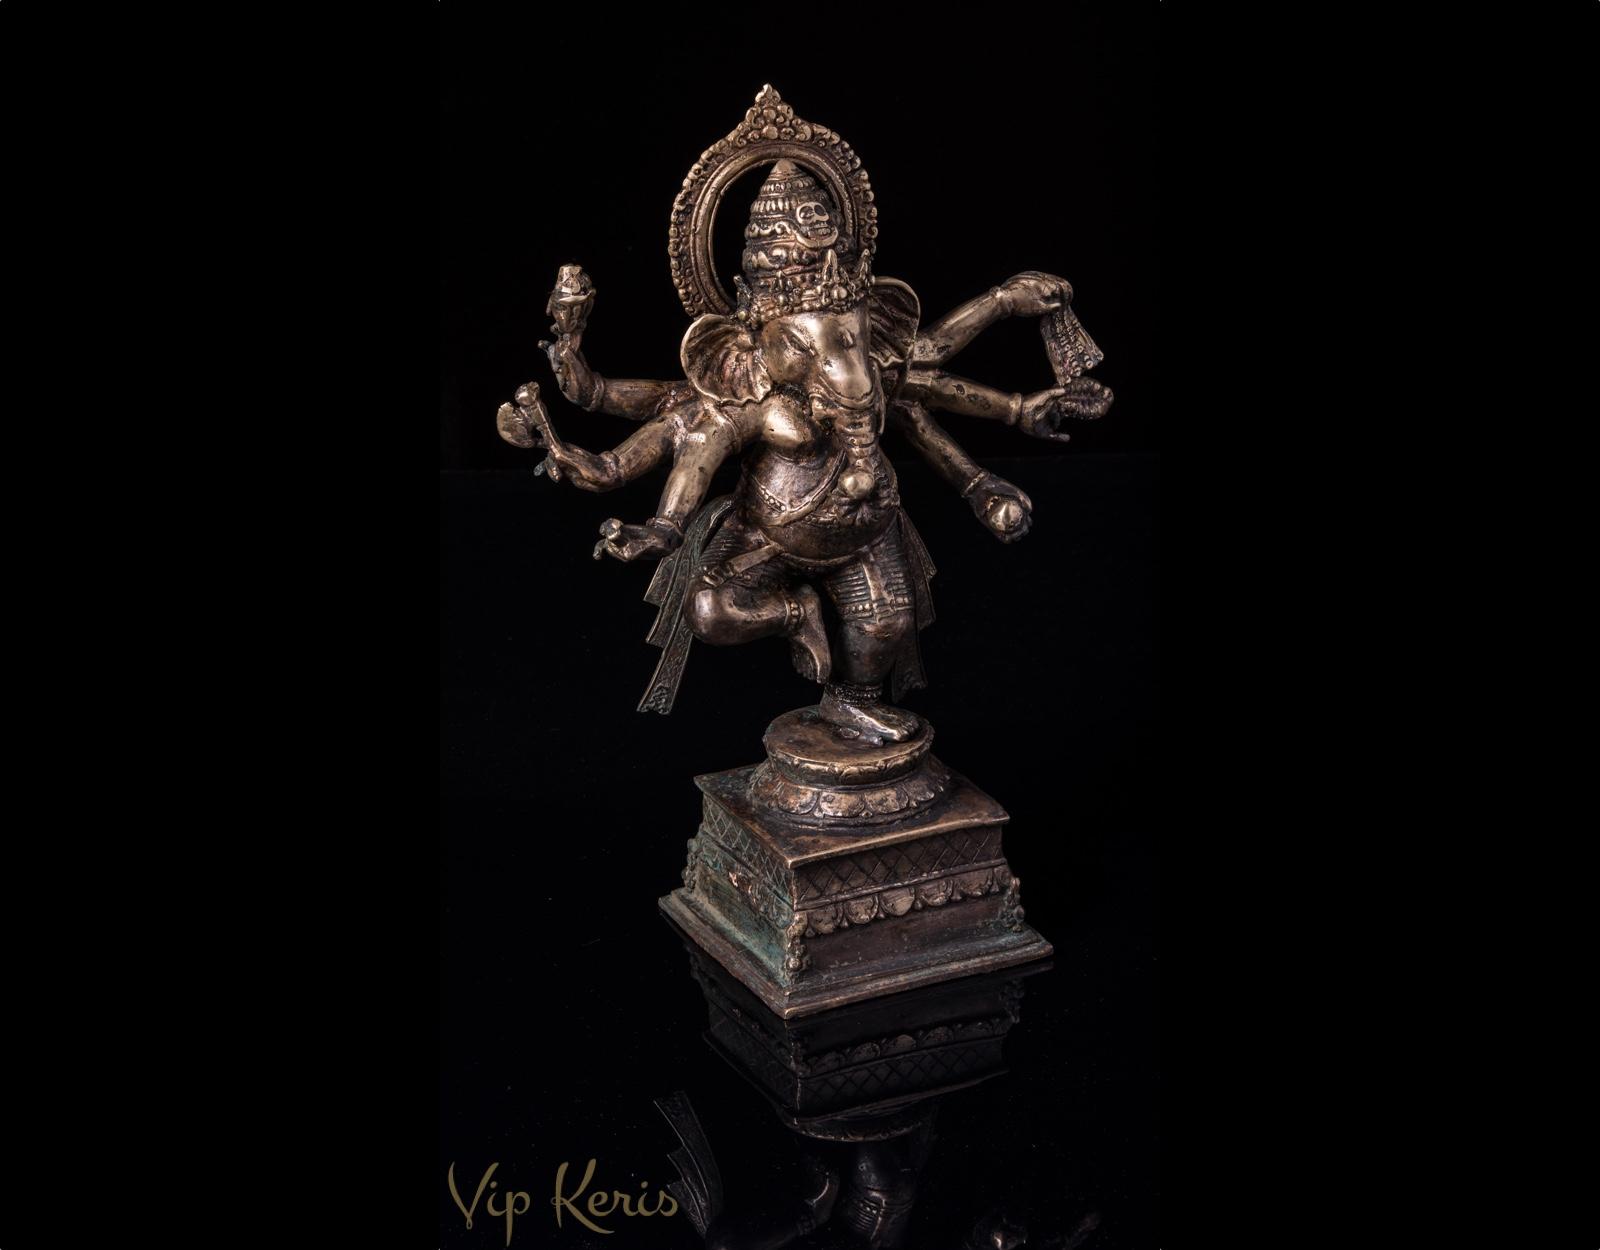 Старинная бронзовая статуя Ганеша фото VipKeris